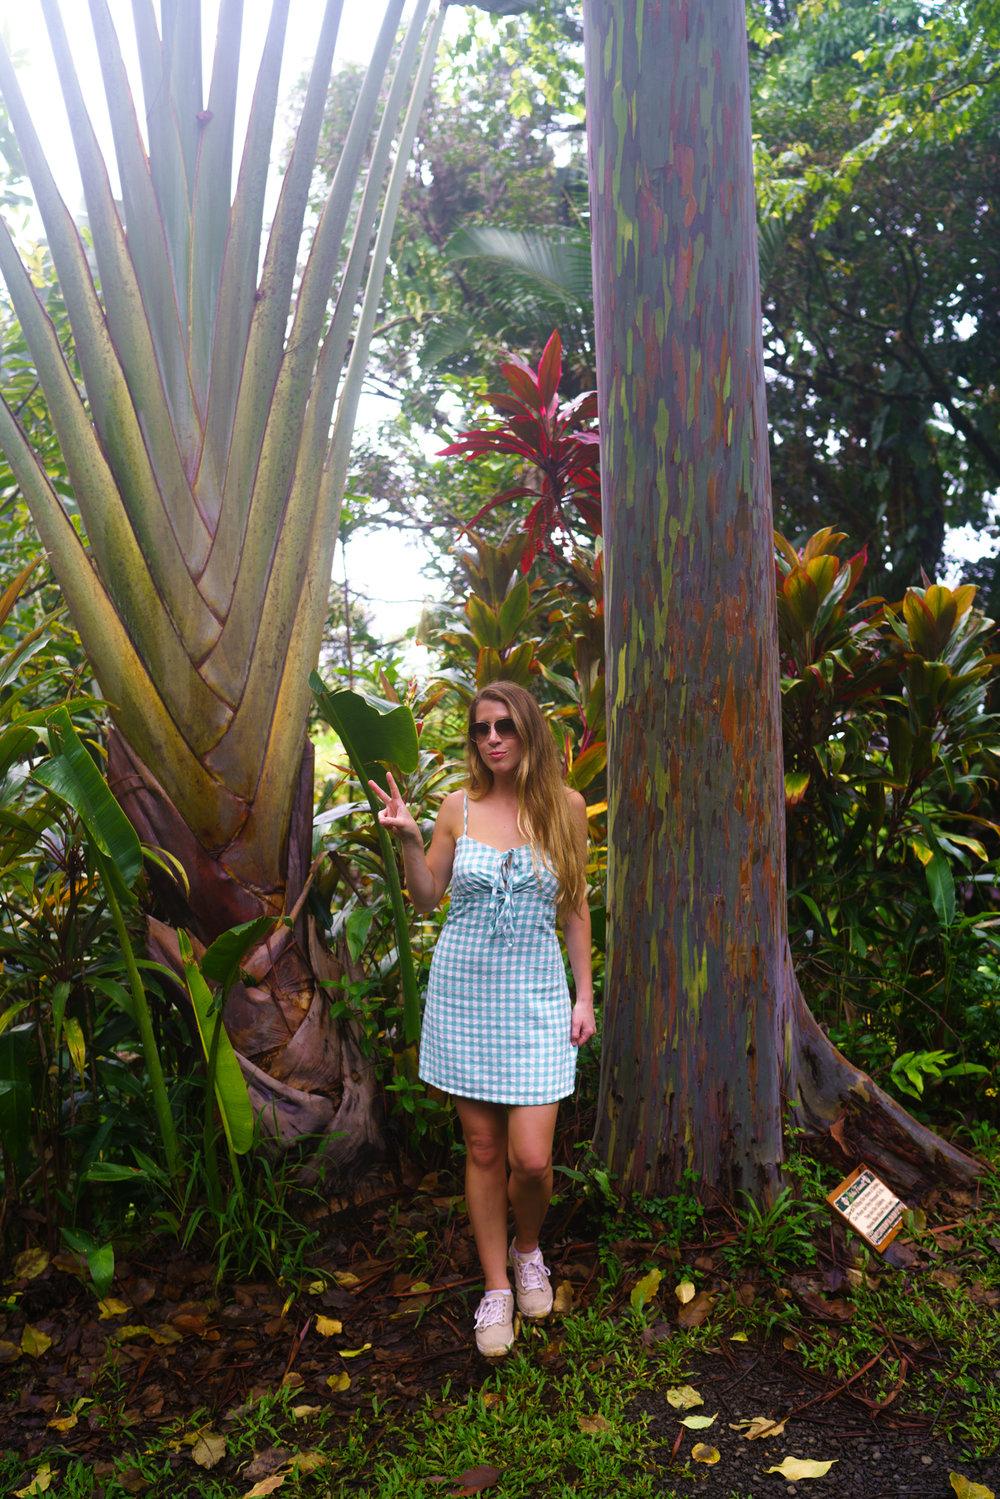 Rainbow Eucalyptus Tree in Maui | Never Settle Travel